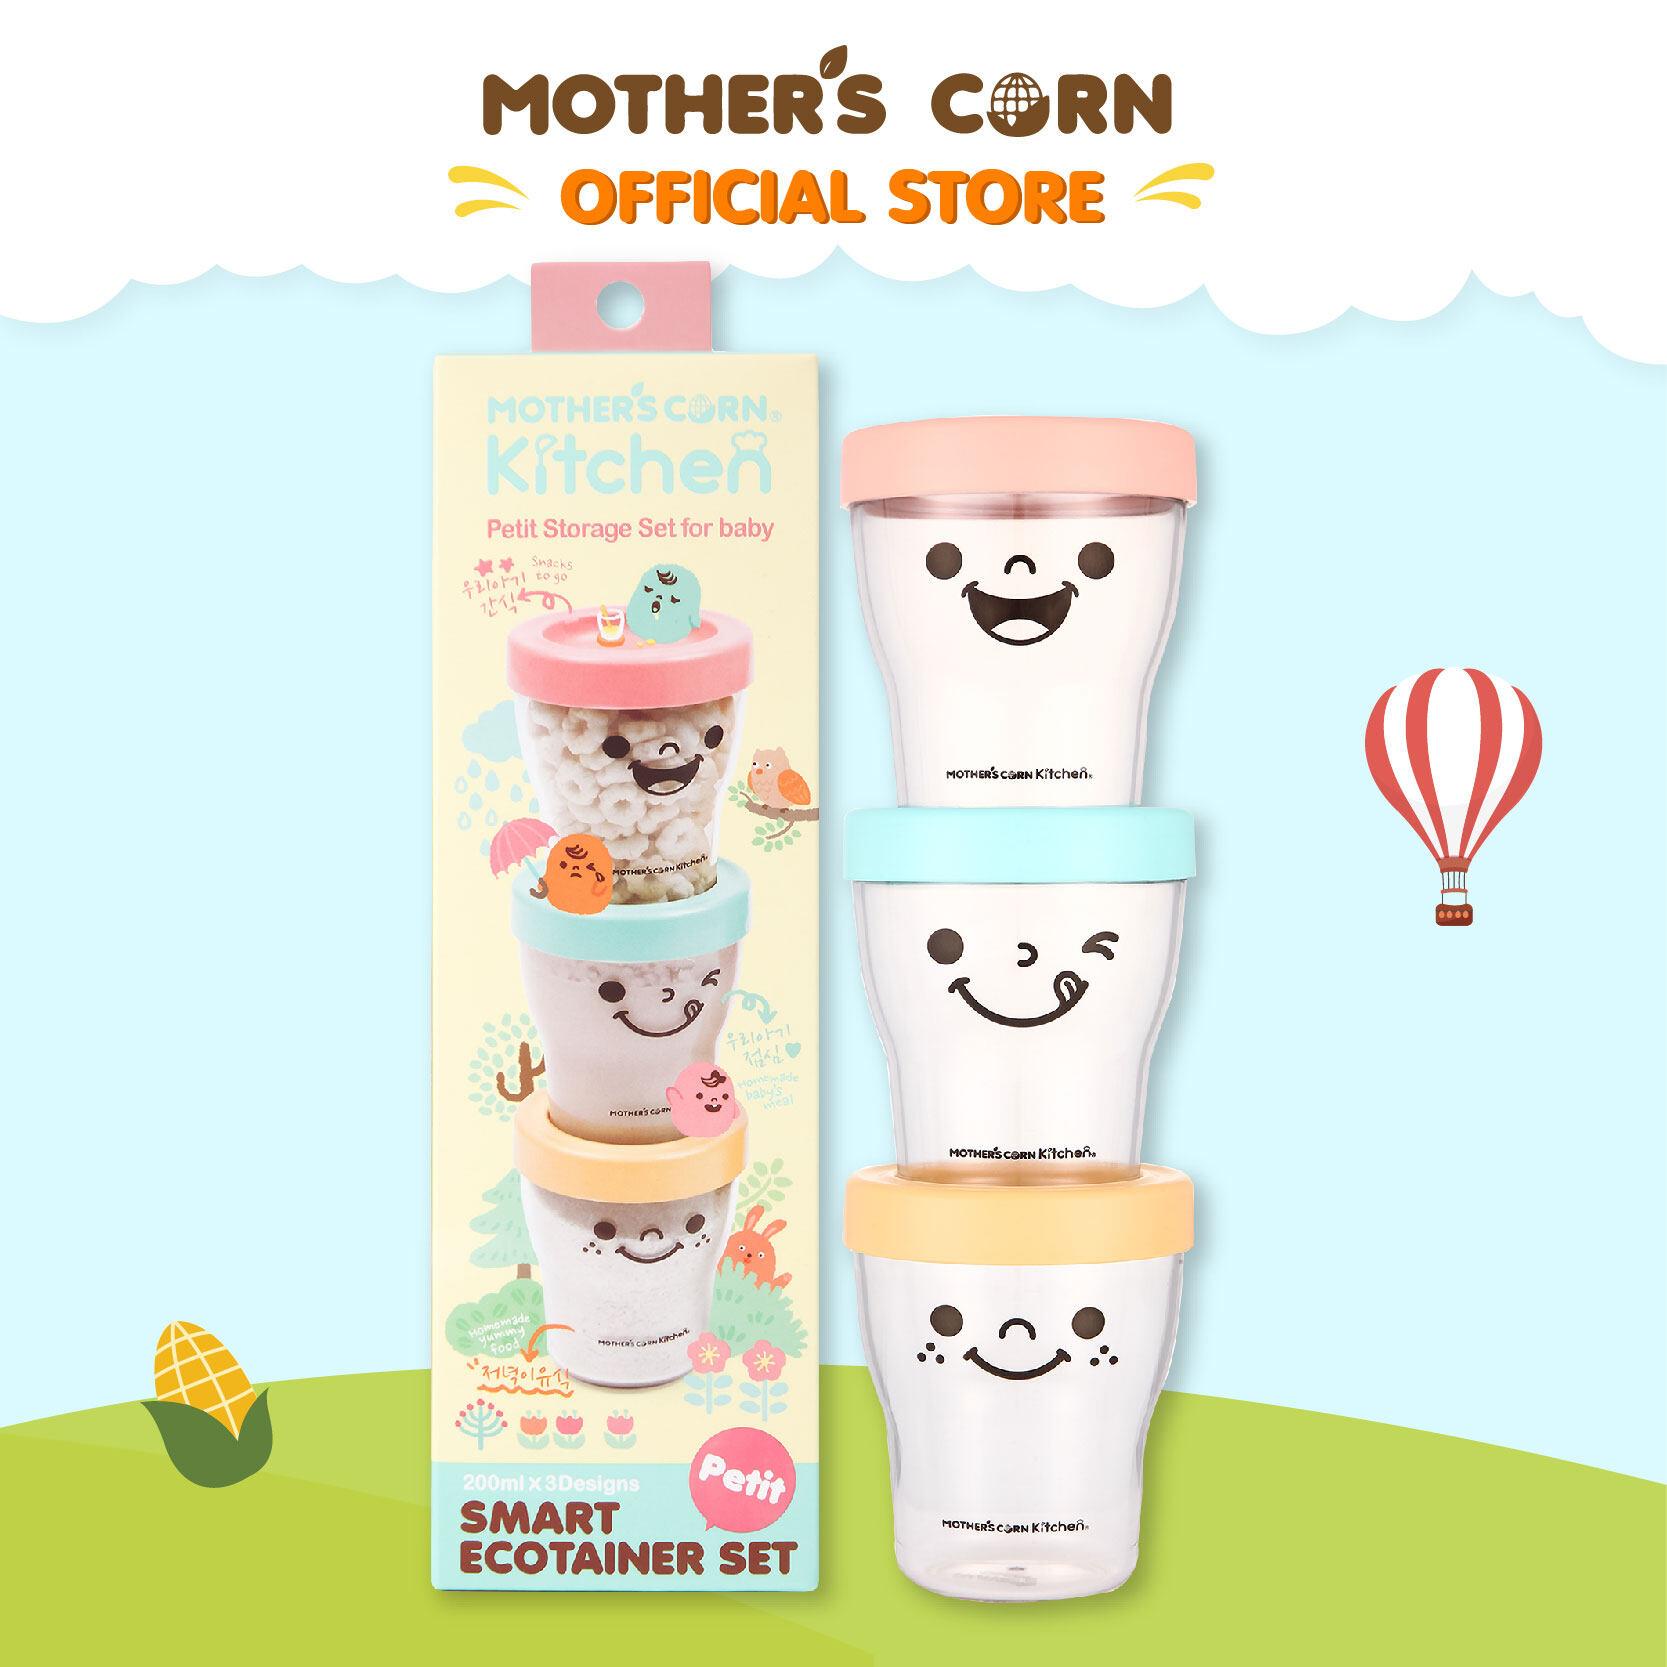 Mothers Corn Ecotainert Set มาเธอร์คอน ถ้วยยิ้มสำหรับเก็บอาหาร.